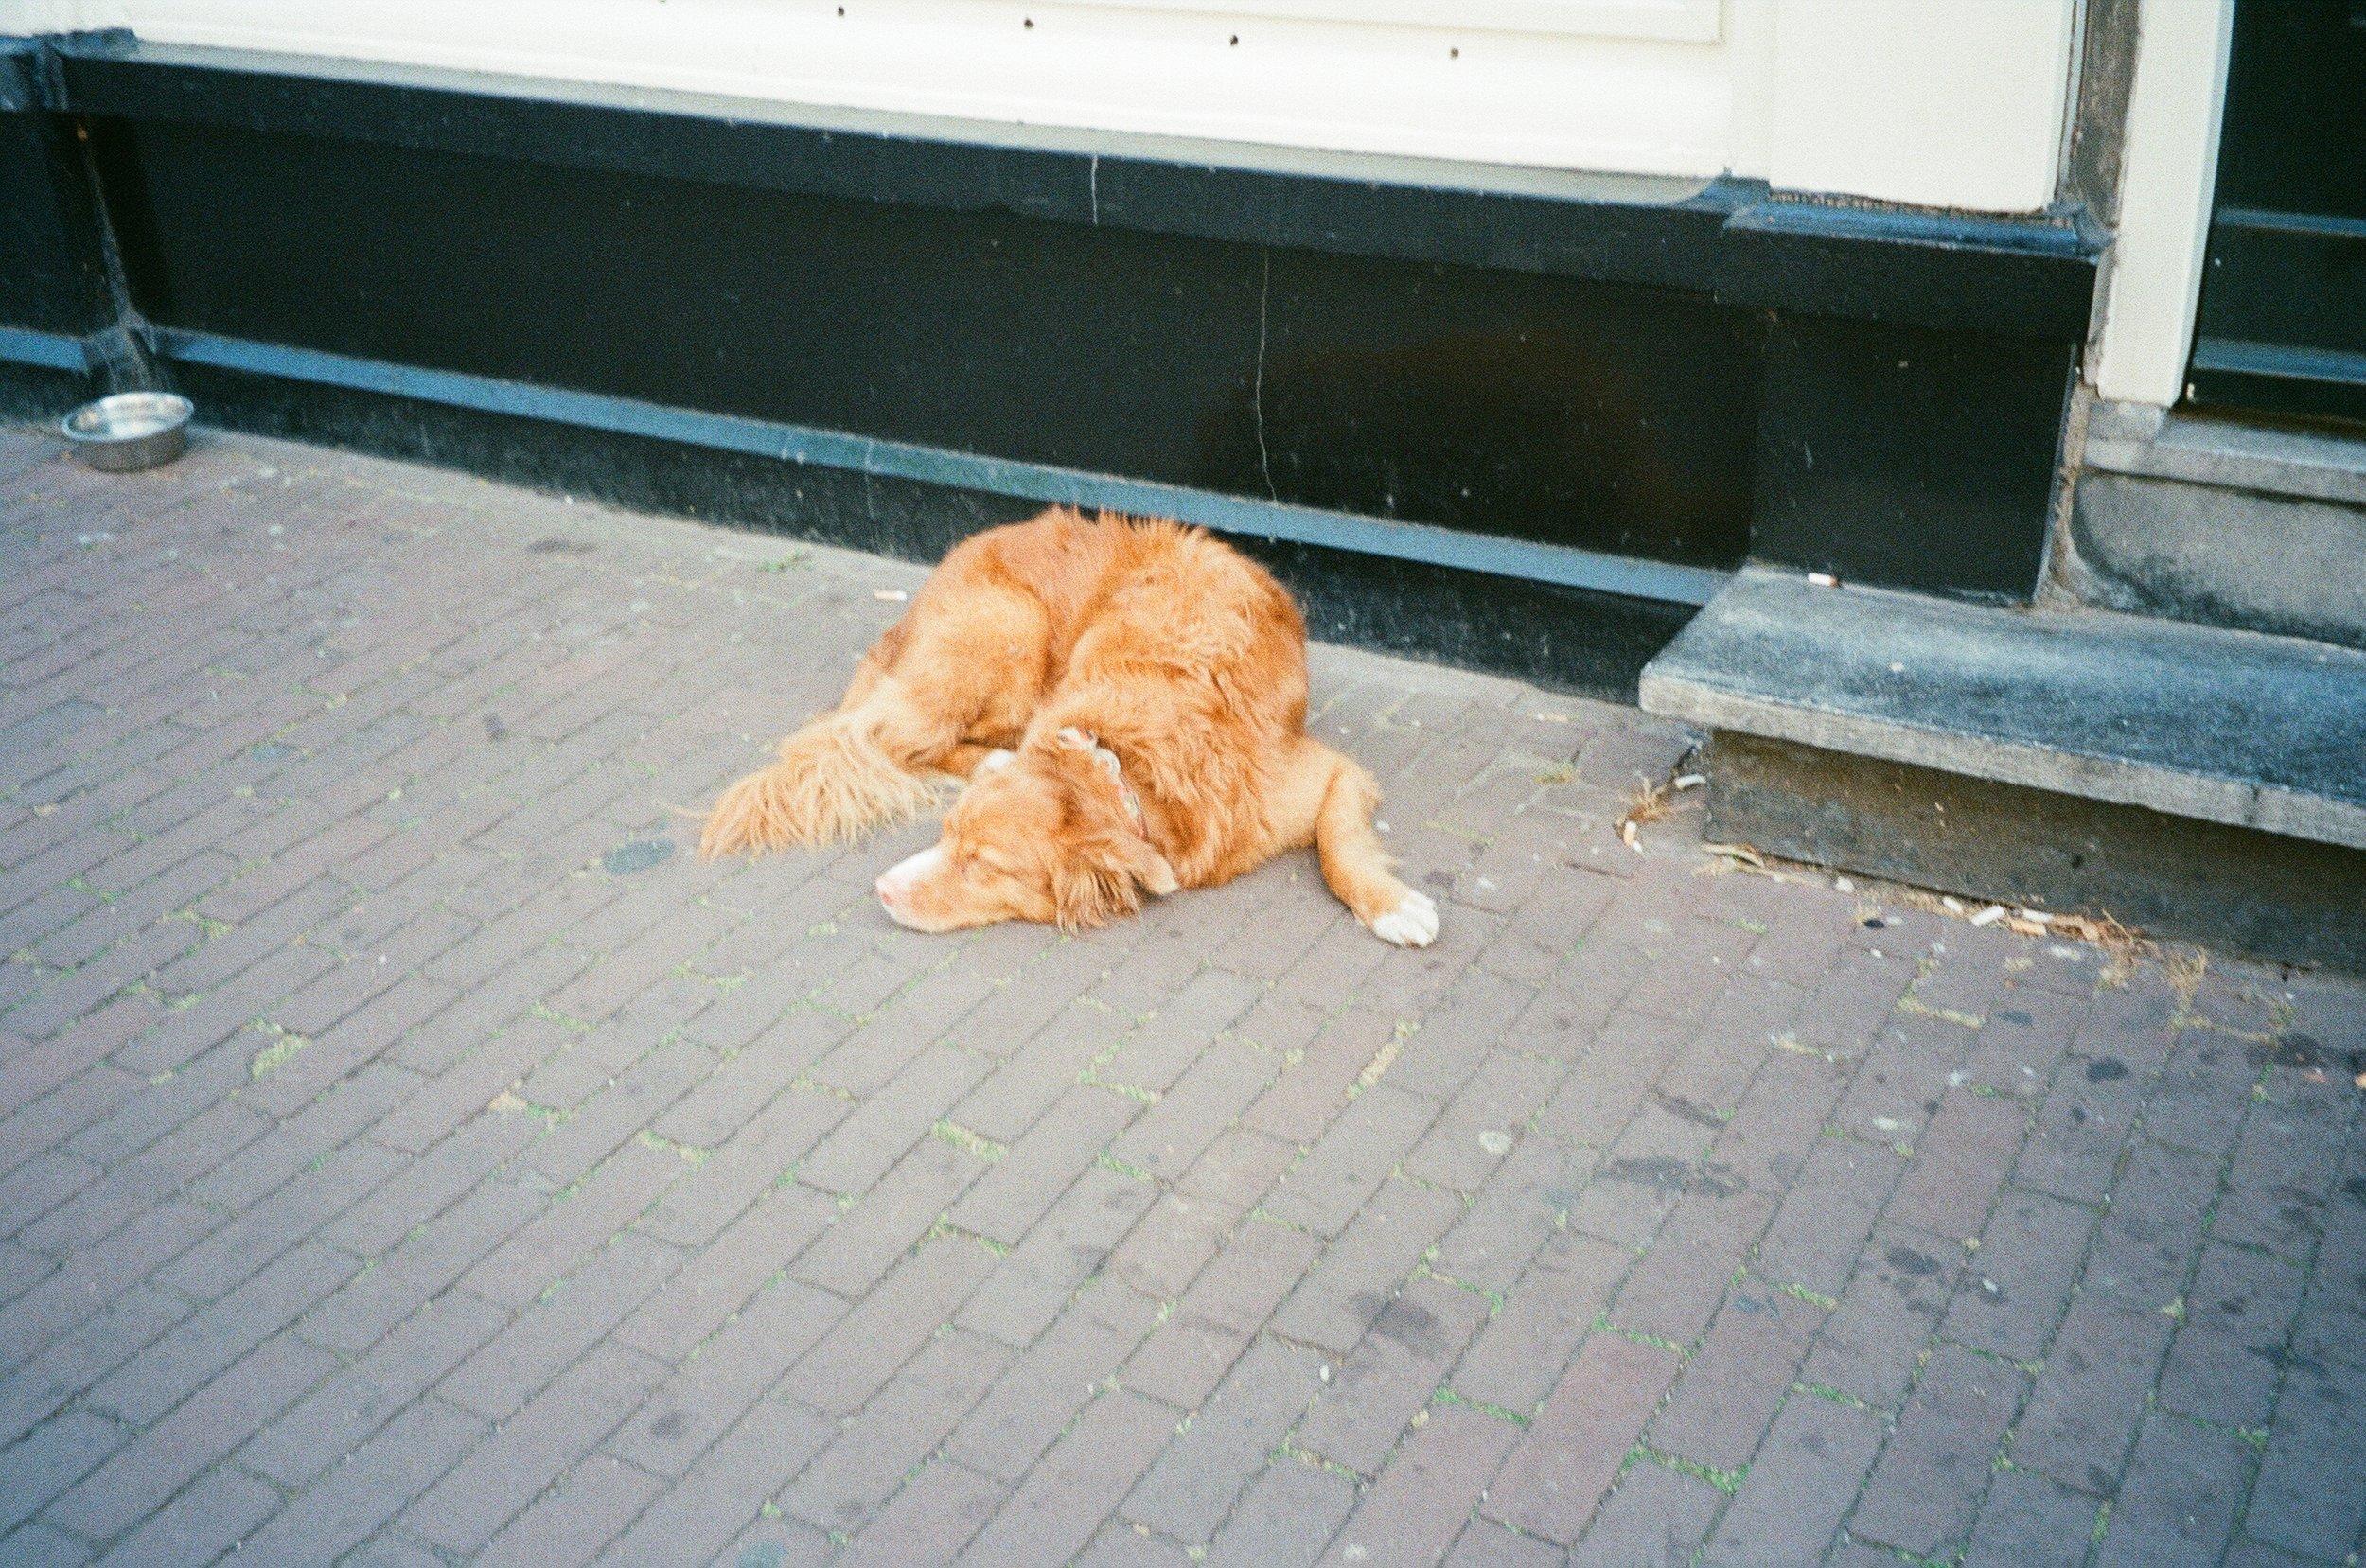 Amsterdam, August 2018